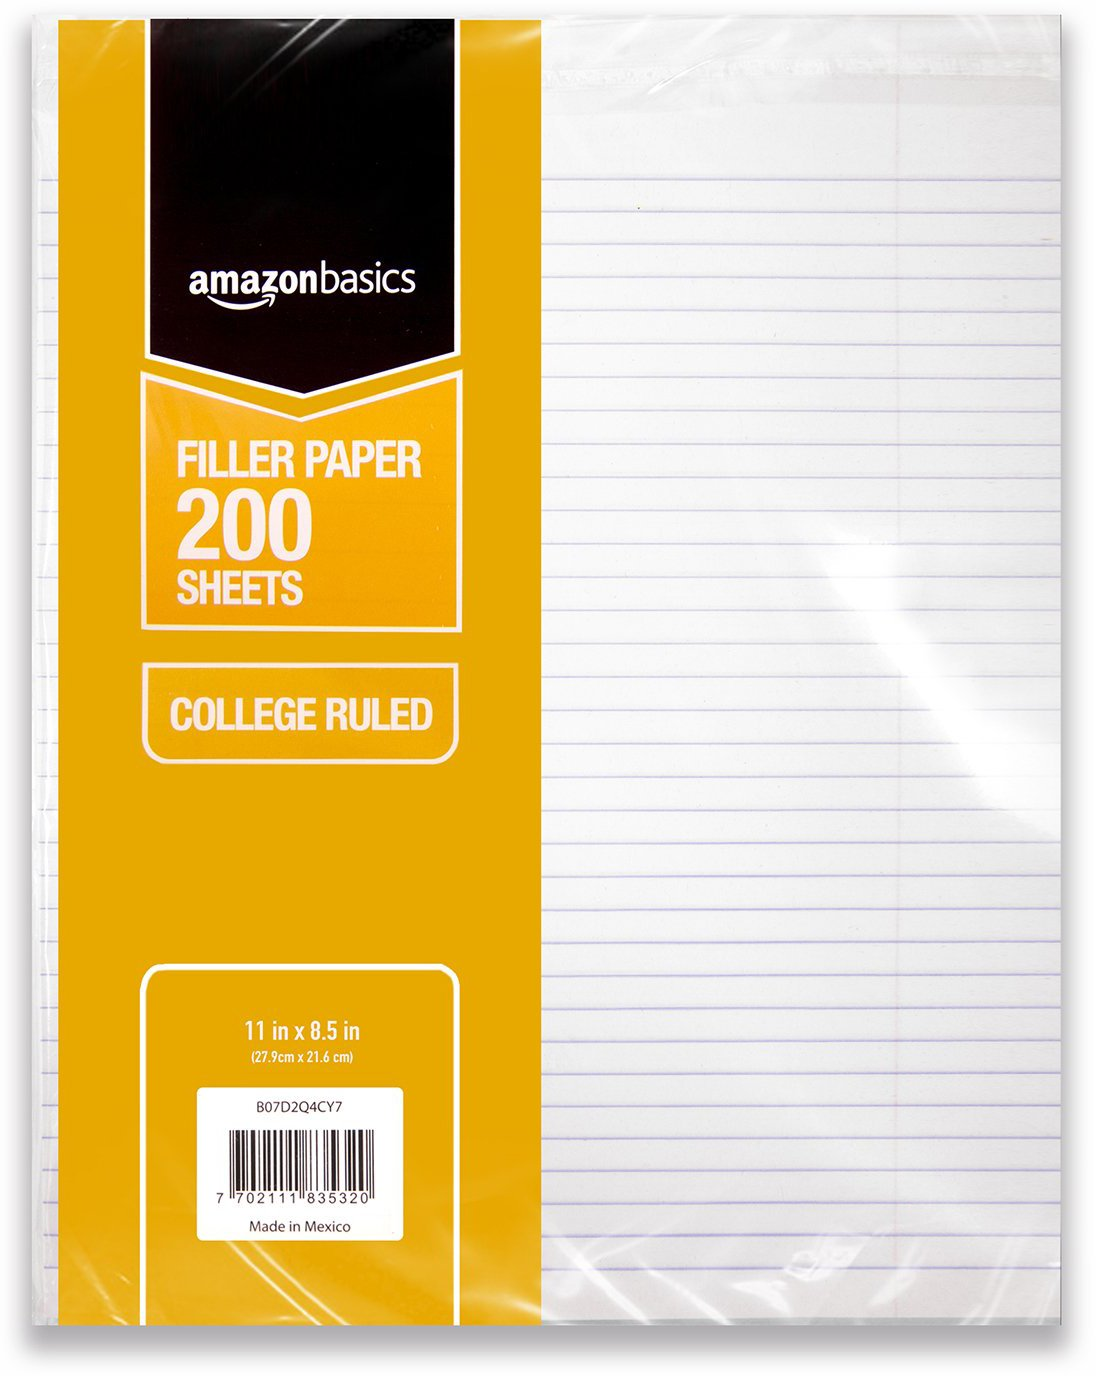 AmazonBasics College Ruled Loose Leaf Filler Paper, 200-Sheet, 11'' x 8.5'', 6-Pack